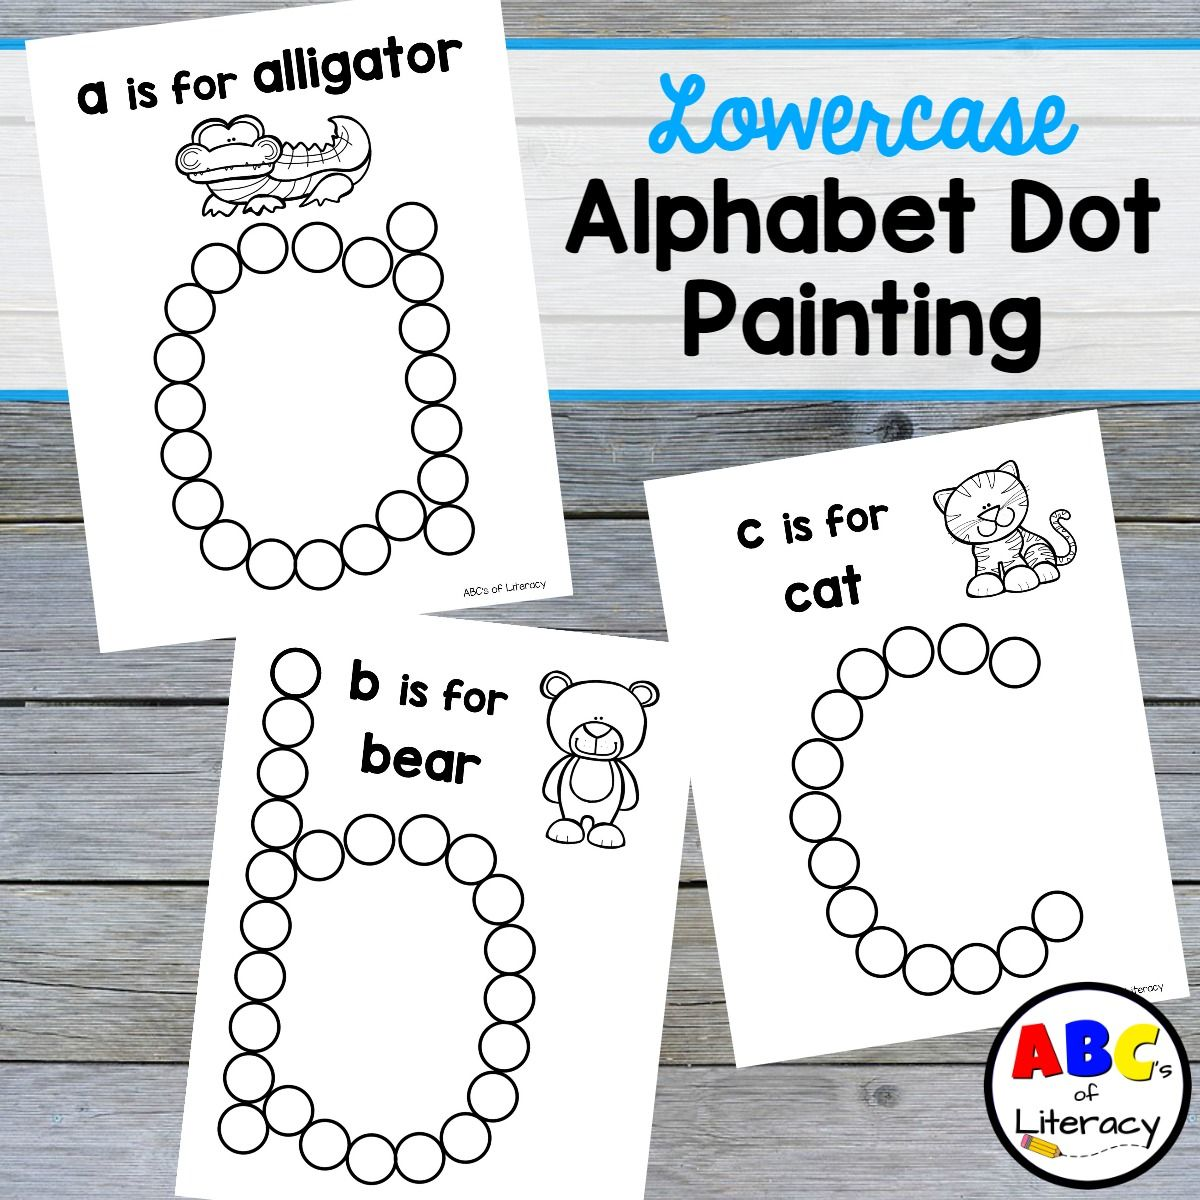 Lowercase Alphabet Dot Painting Free Printables Abc S Of Literacy Preschool Letters Alphabet Preschool Preschool Learning [ 1200 x 1200 Pixel ]